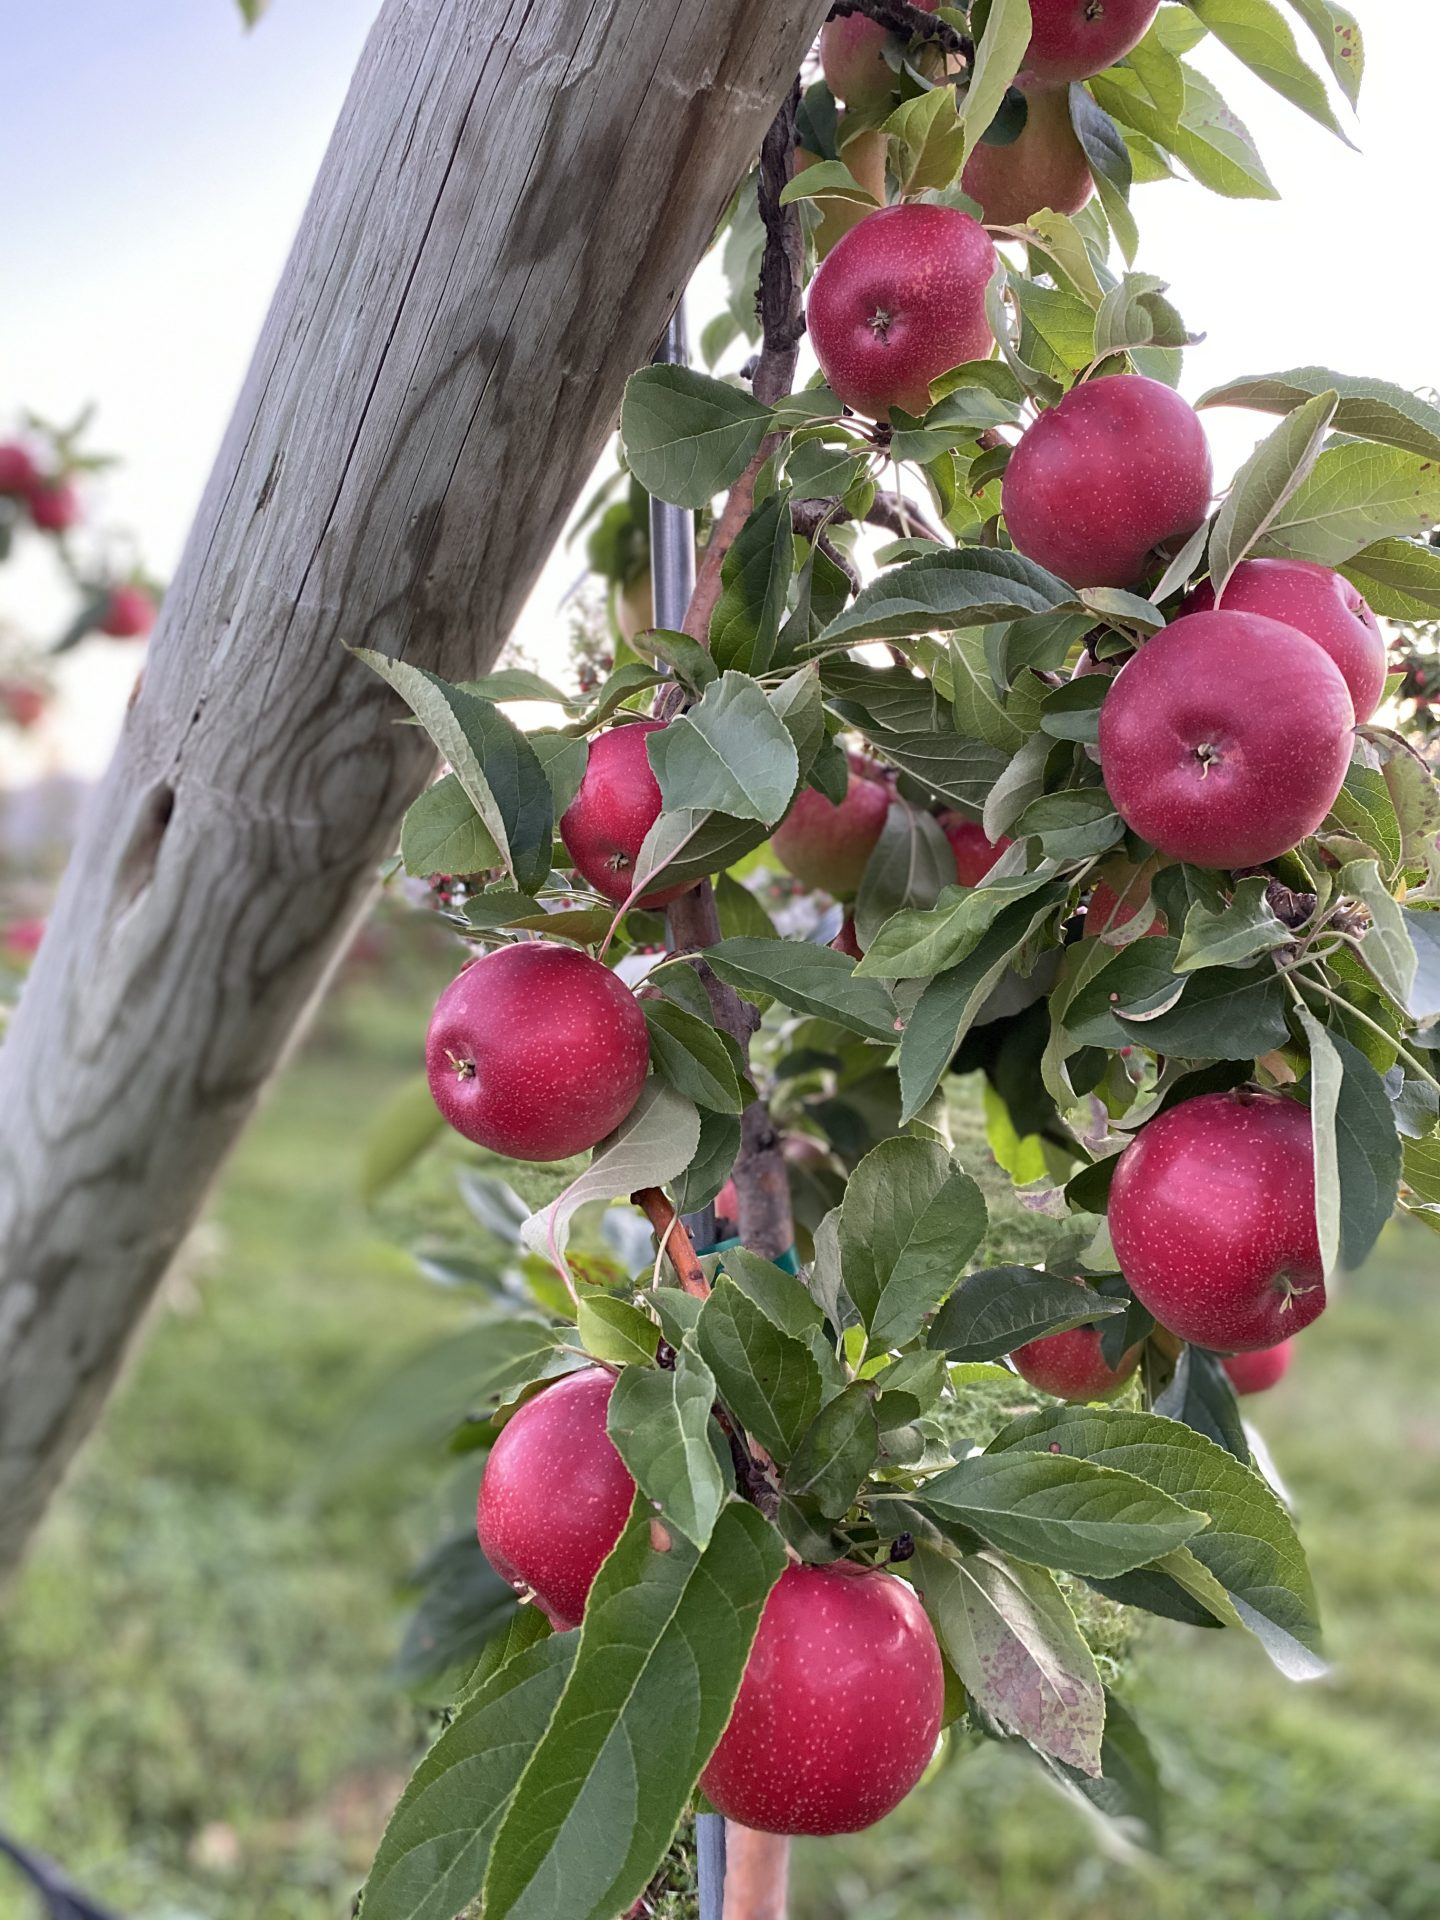 2020.9.3 Taken Pine Tree Orchard Apples on tree 3